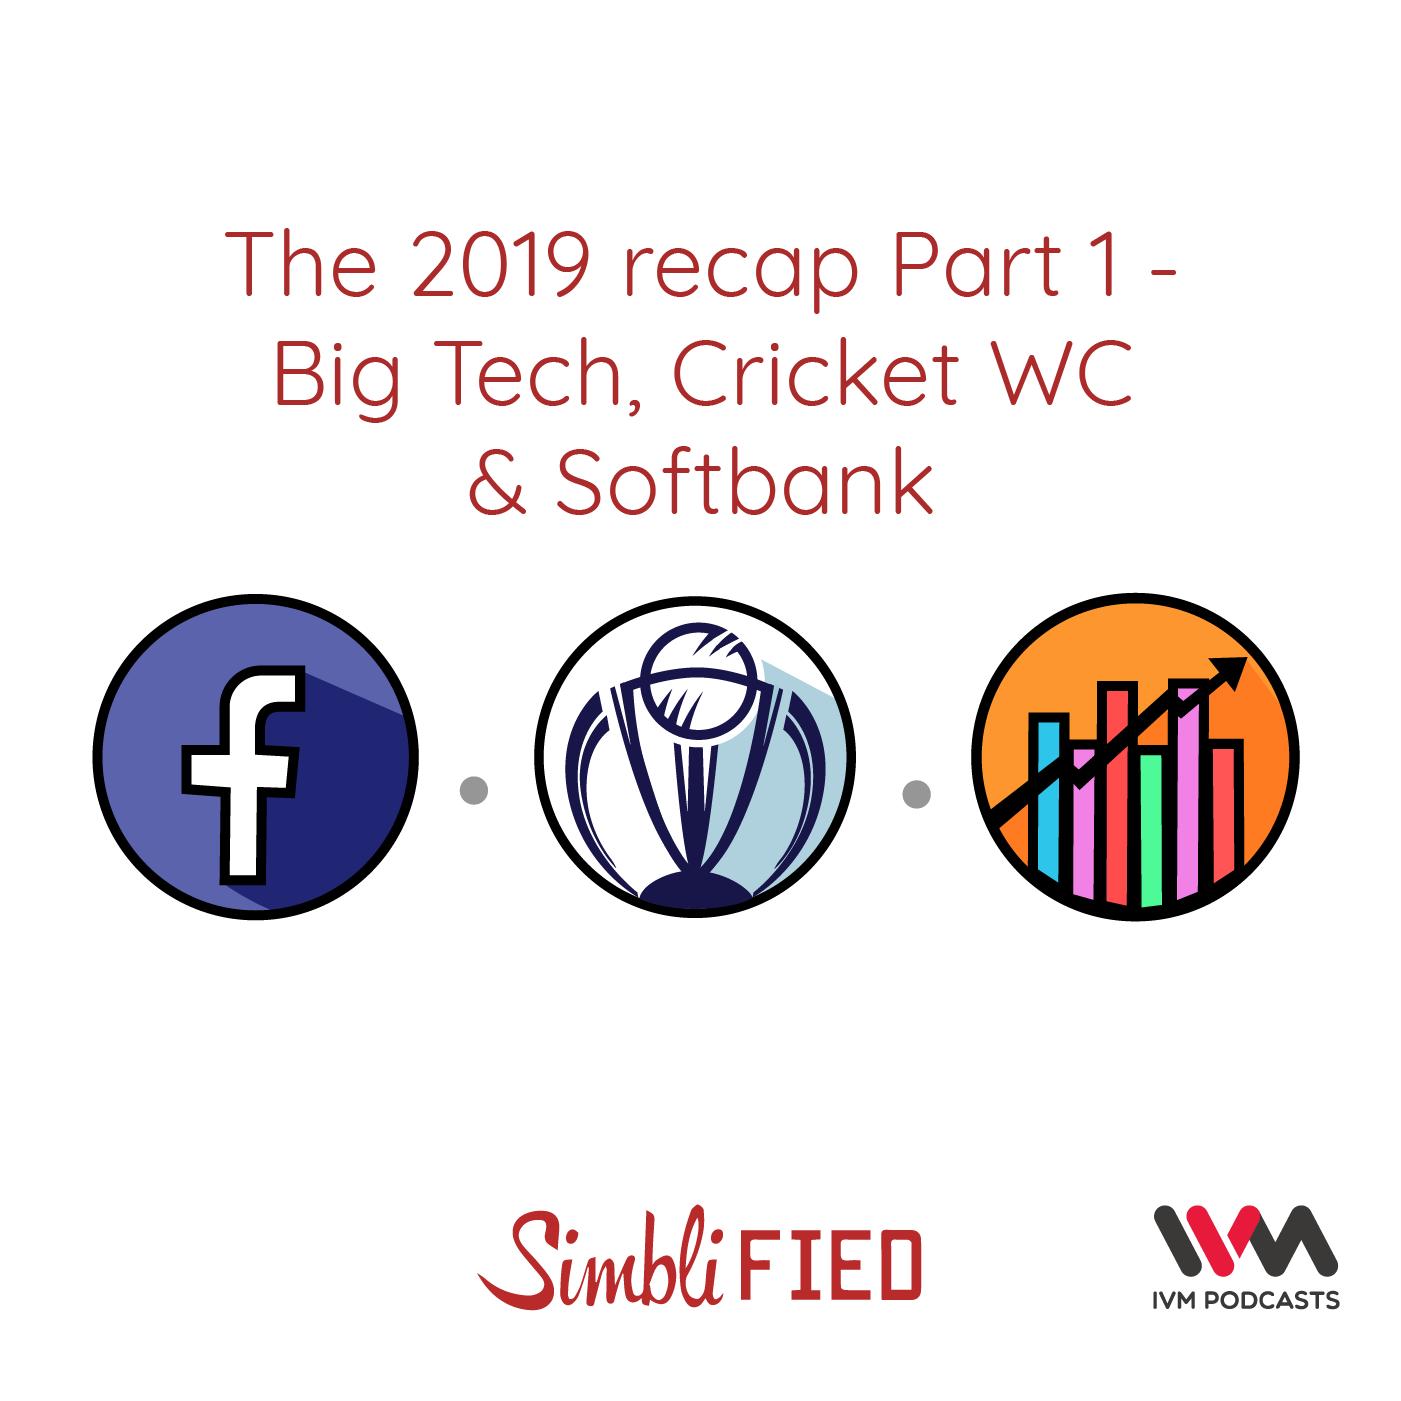 Ep. 161: The 2019 recap Part 1 - Big Tech, Cricket WC & Softbank